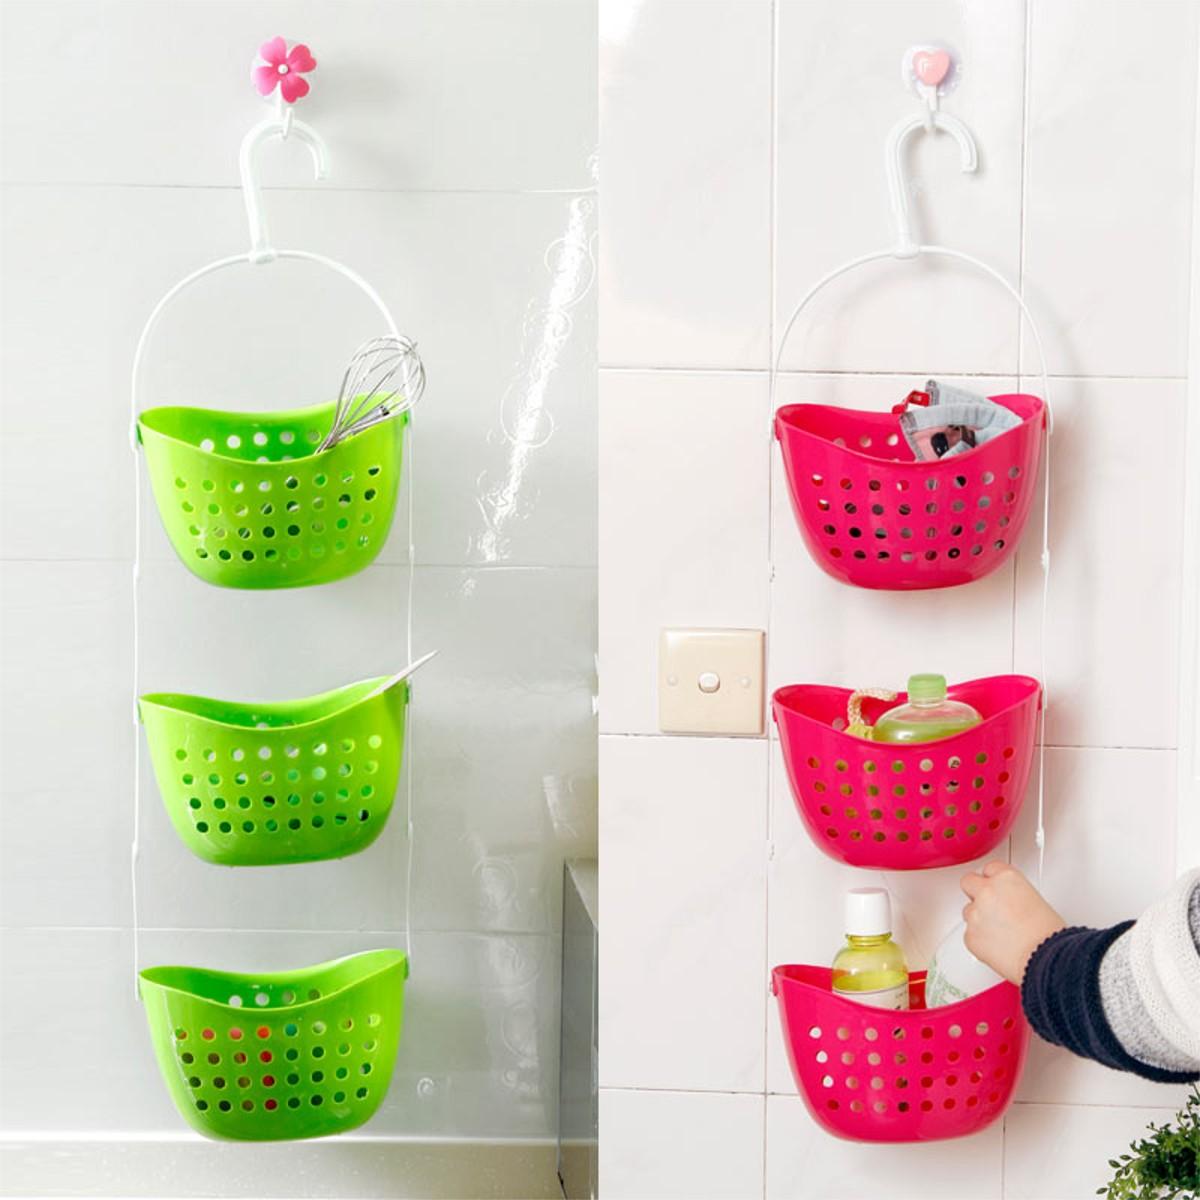 3Pcs set Shower Bathroom Hanging Basket Mutifunctional Caddy Plastic Rack Kitchen Organizer Storage Container Space Save. Hanging Bathroom Basket Promotion Shop for Promotional Hanging